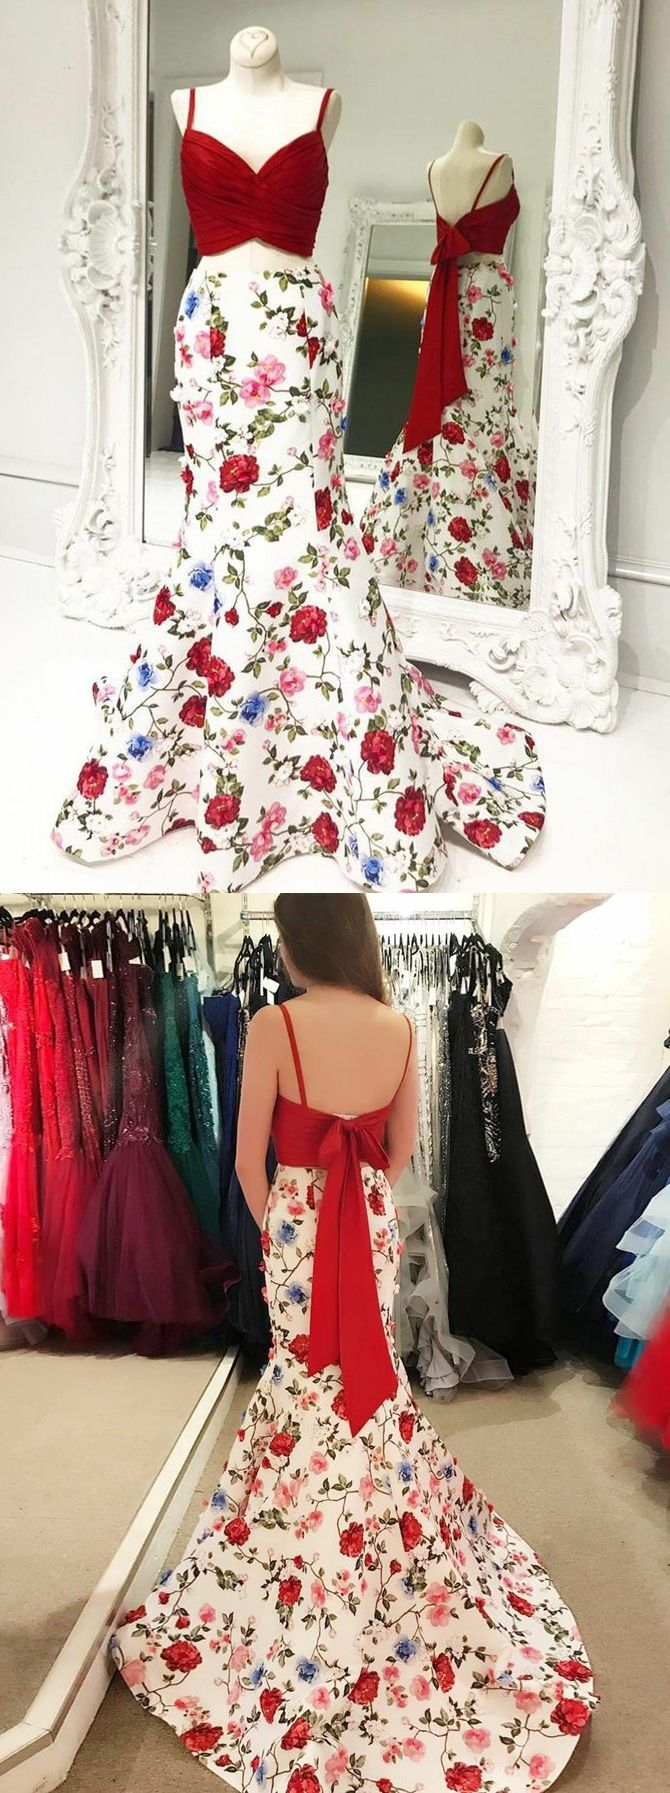 Mermaid prom dresses spaghetti straps floral print long prom dress